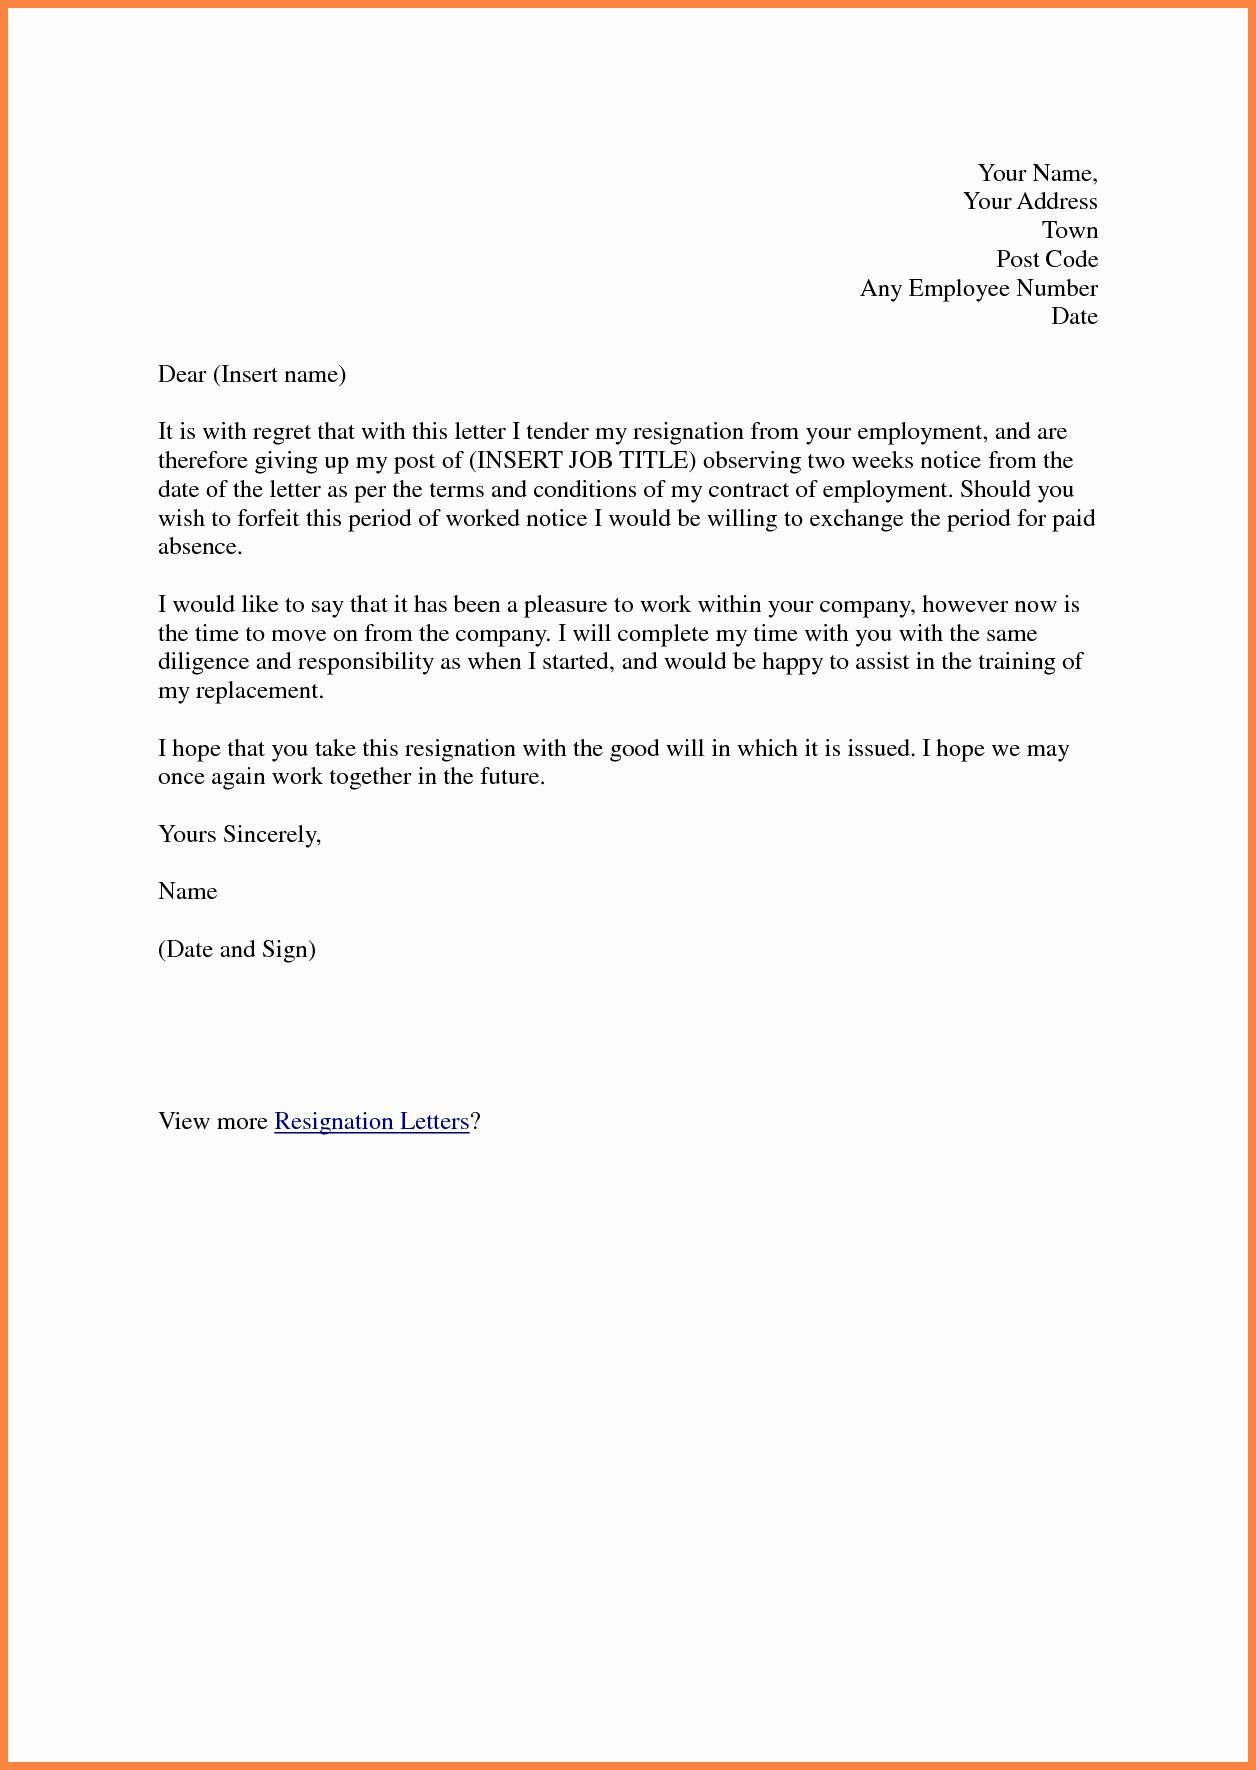 Resignation Letter 2 Week Notice Fresh 6 Sample Of Resignation Letter Two Weeks Notice Resignation Letter Sample Resignation Letter Lettering Resignation letter 2 week notice pdf